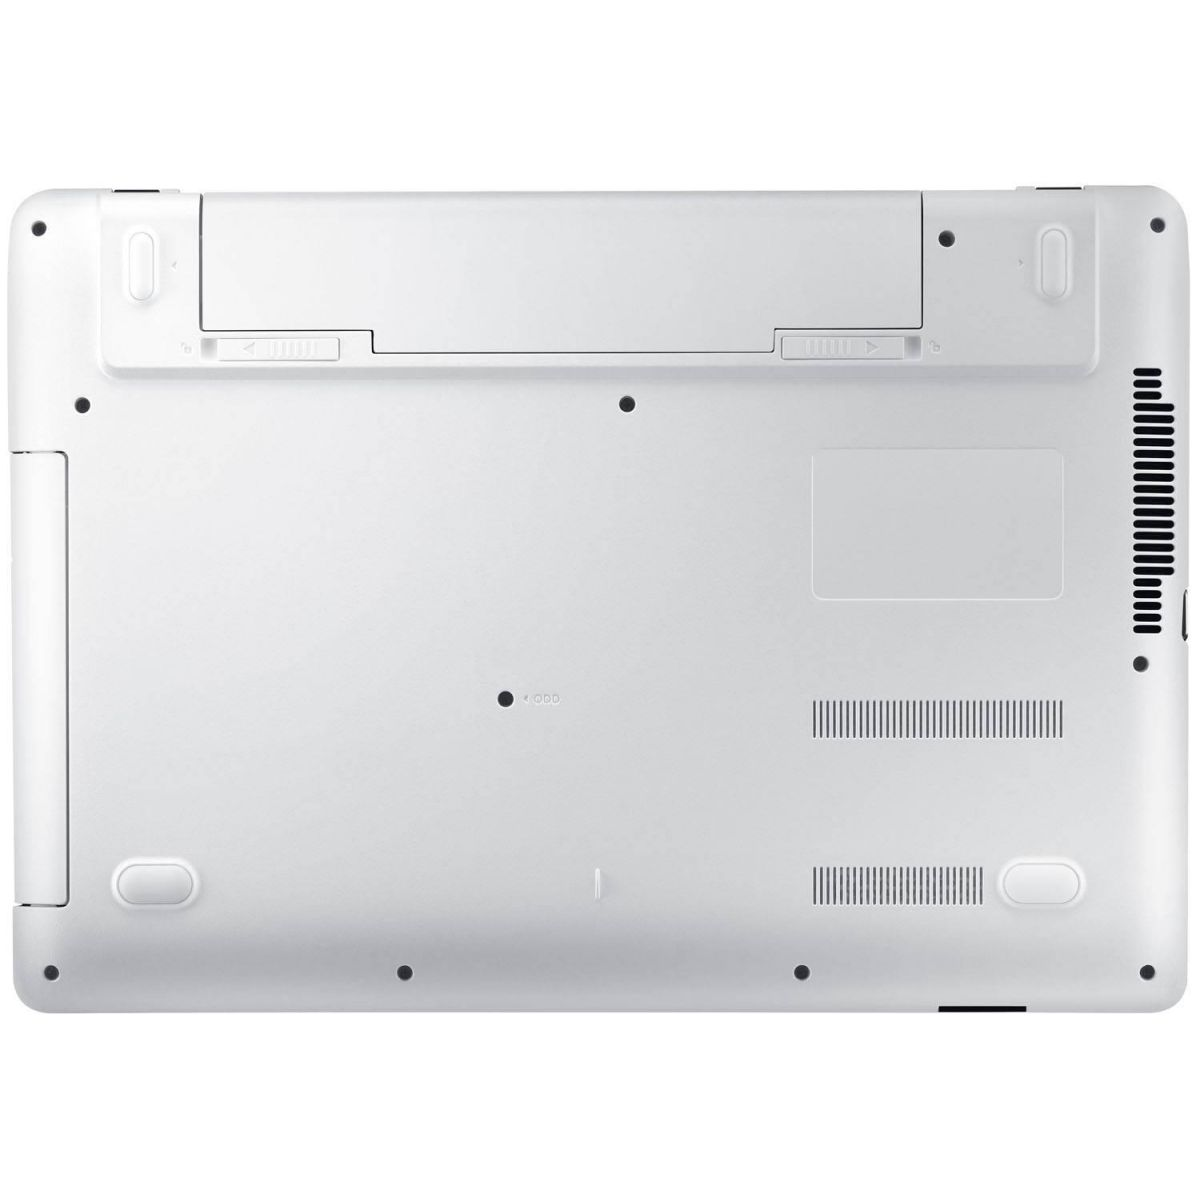 Notebook ATIV Book 3 Intel Core i3 4GB HD 1TB LED 14 HDMI/USB 3.0/Bluetooth Windows 8.1 - Samsung